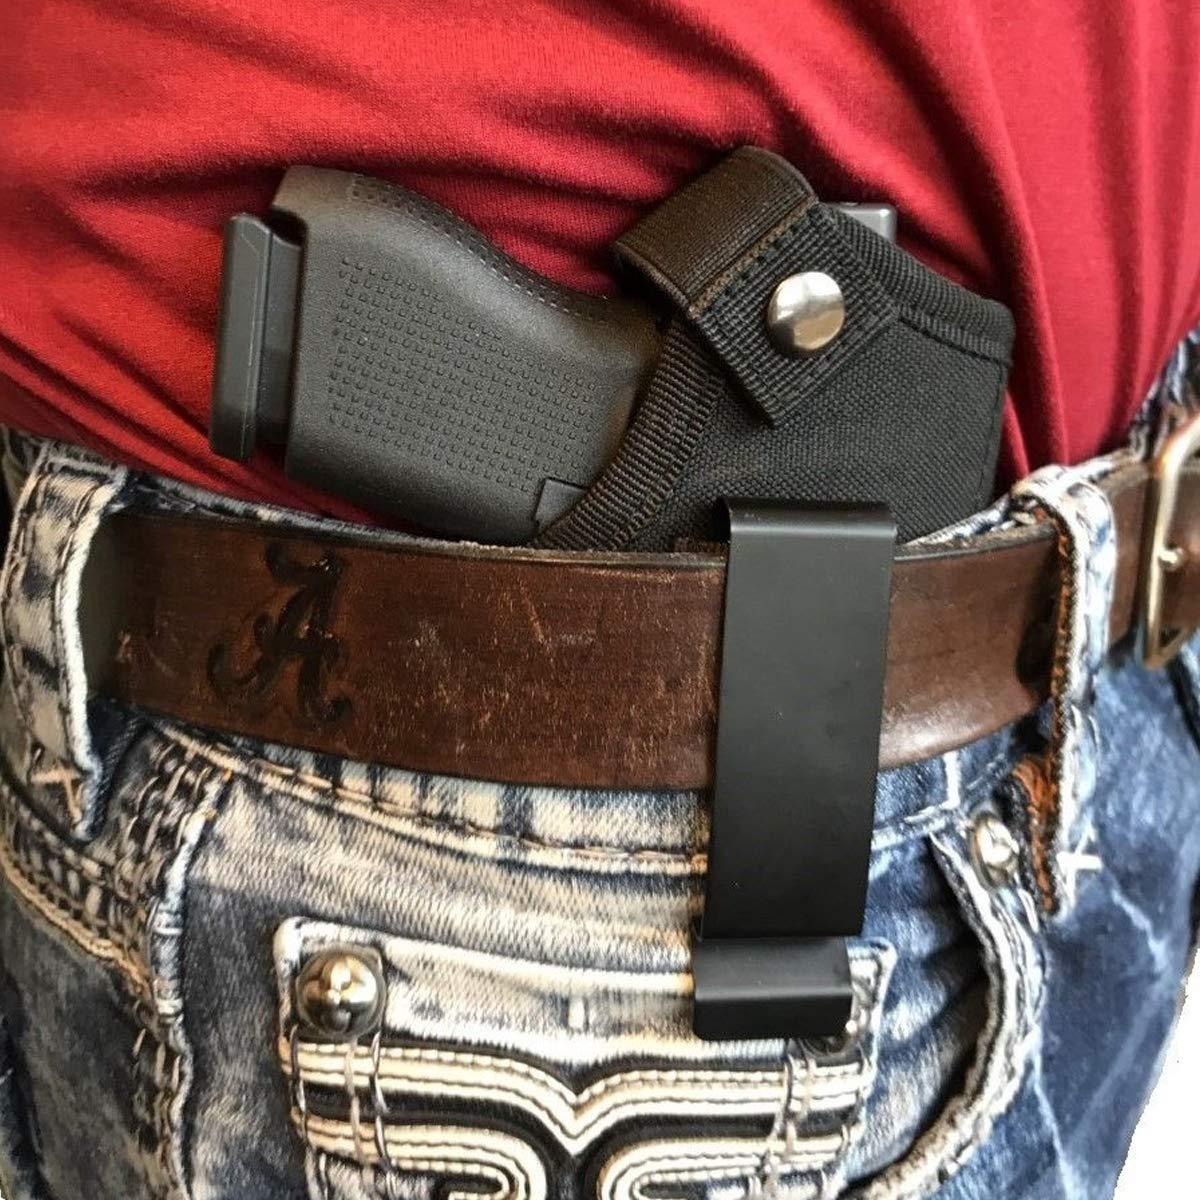 Faviye Combate Deporte Funda de polic/ía Bolsa de Transporte Oculta para Pistola Caza Funda de Pistola